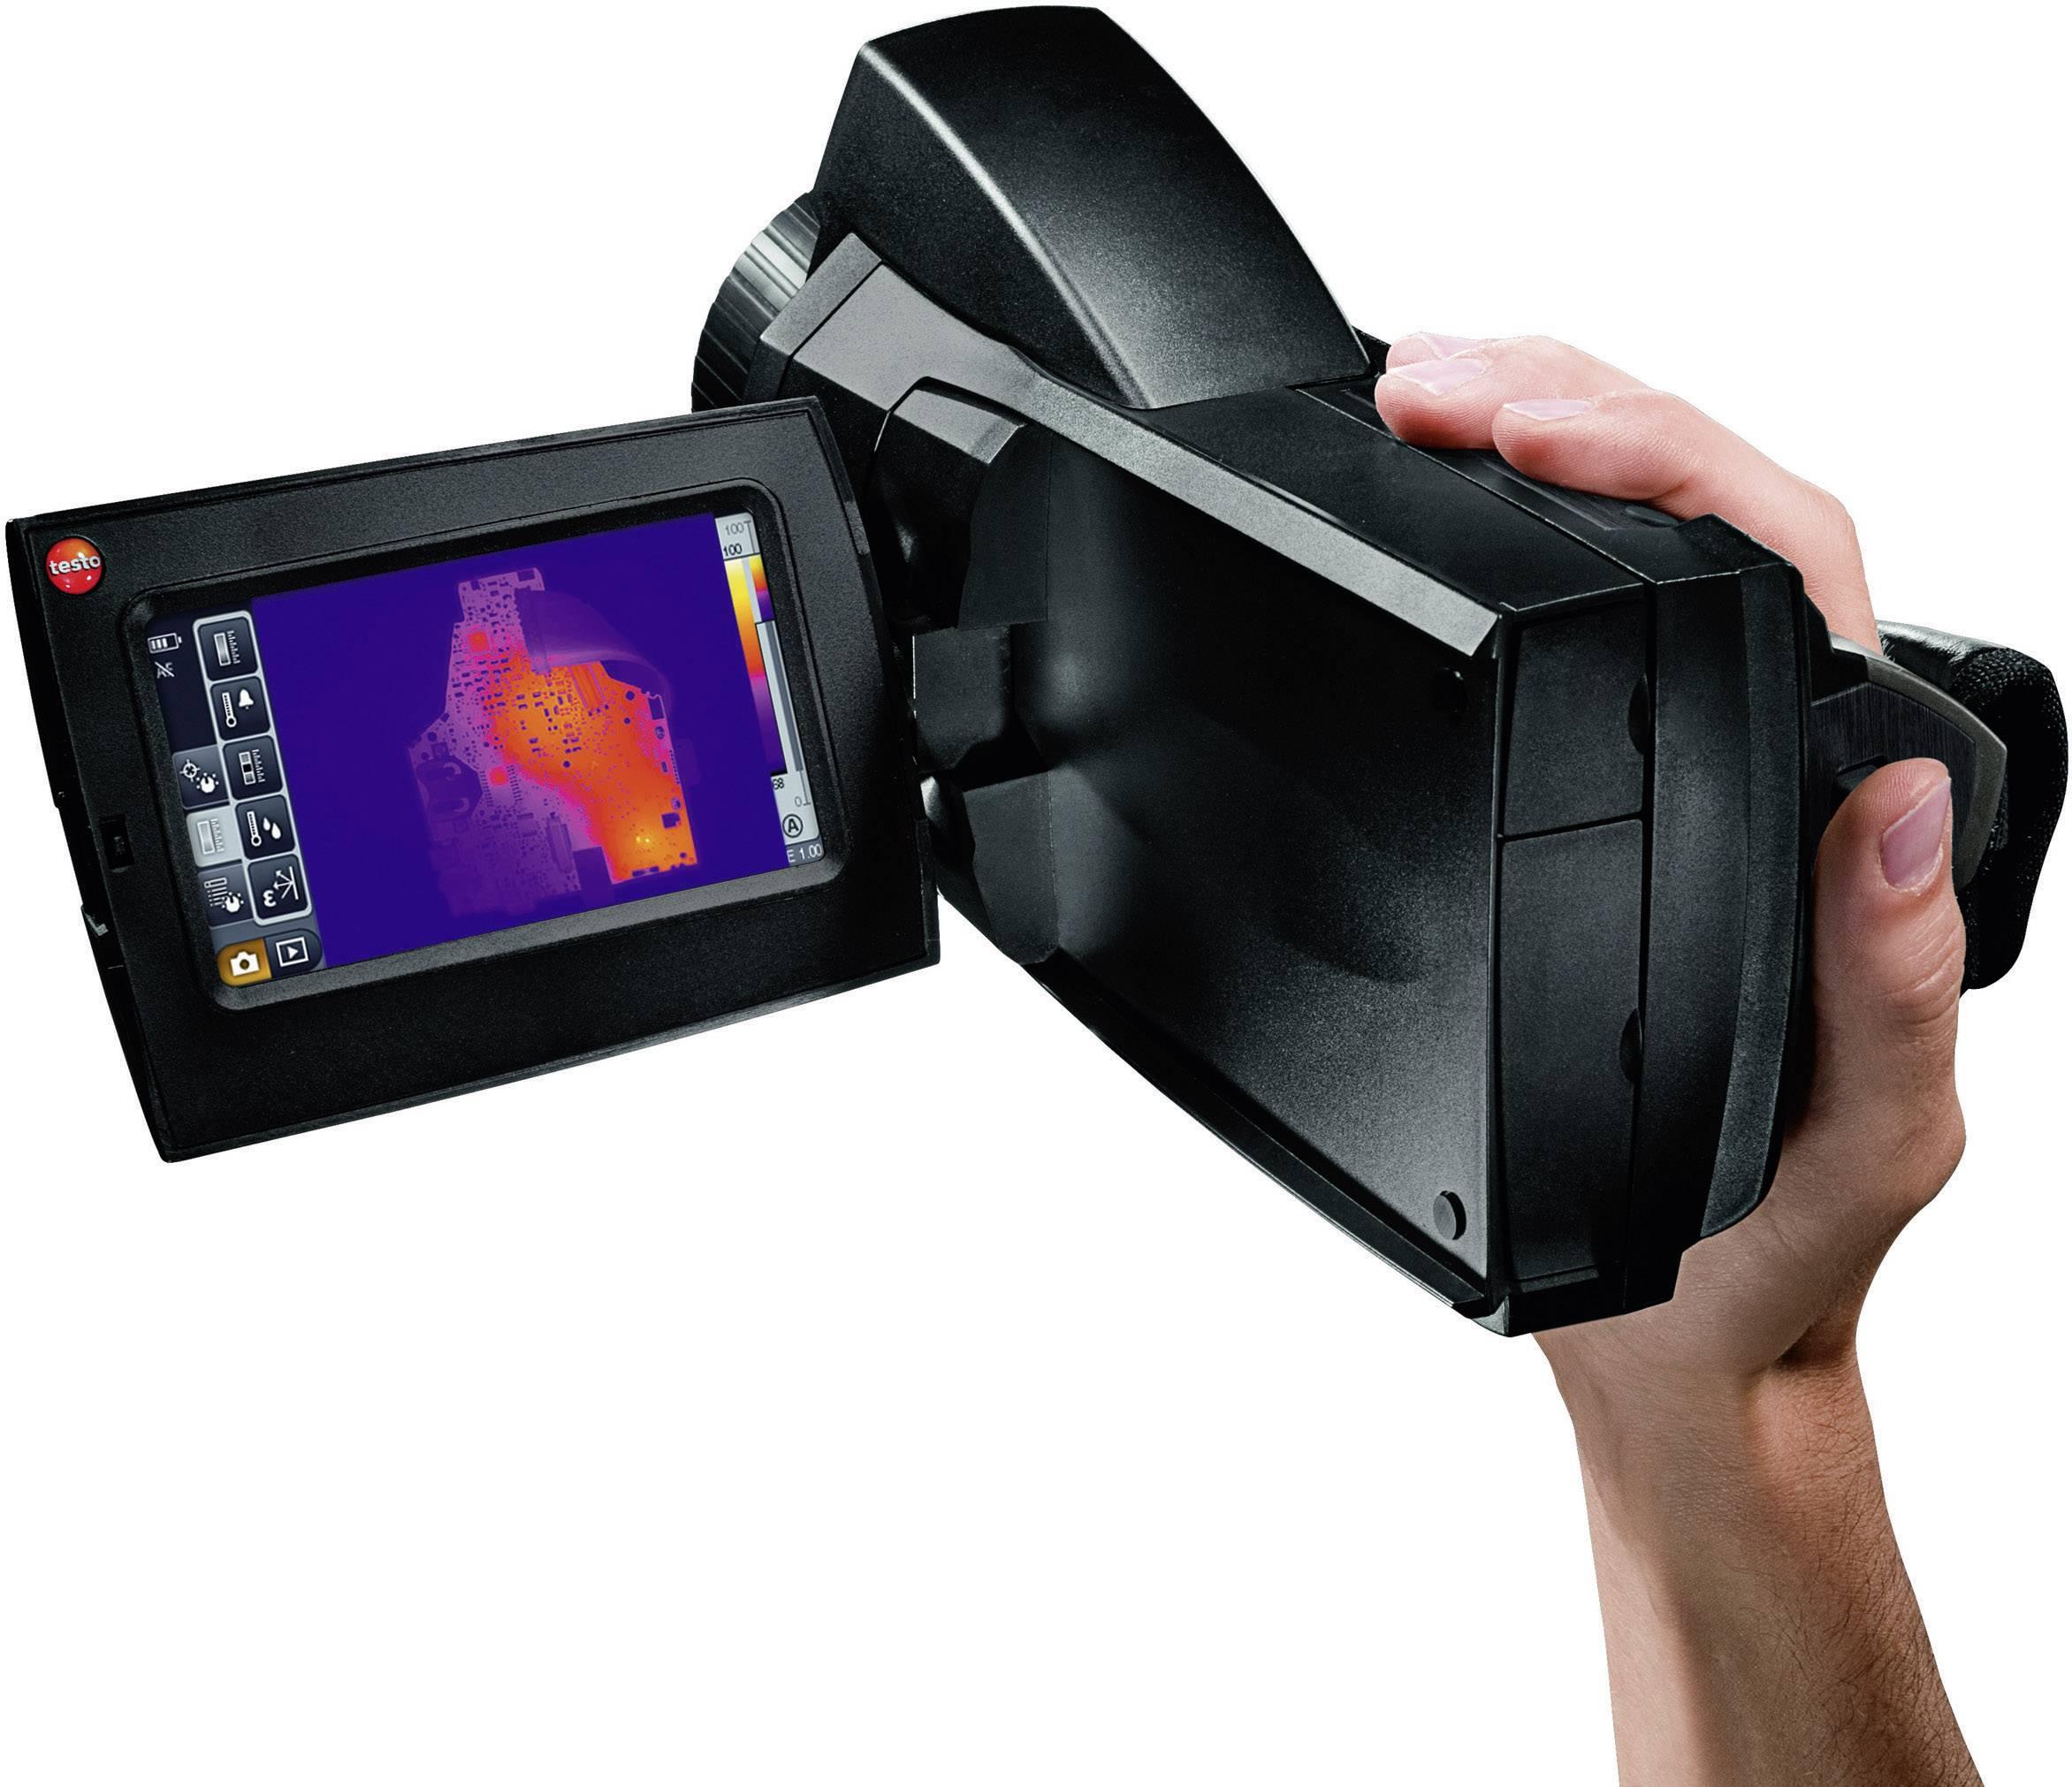 Termálna kamera testo 890-1 0563 0890 V1, 640 x 320 pix